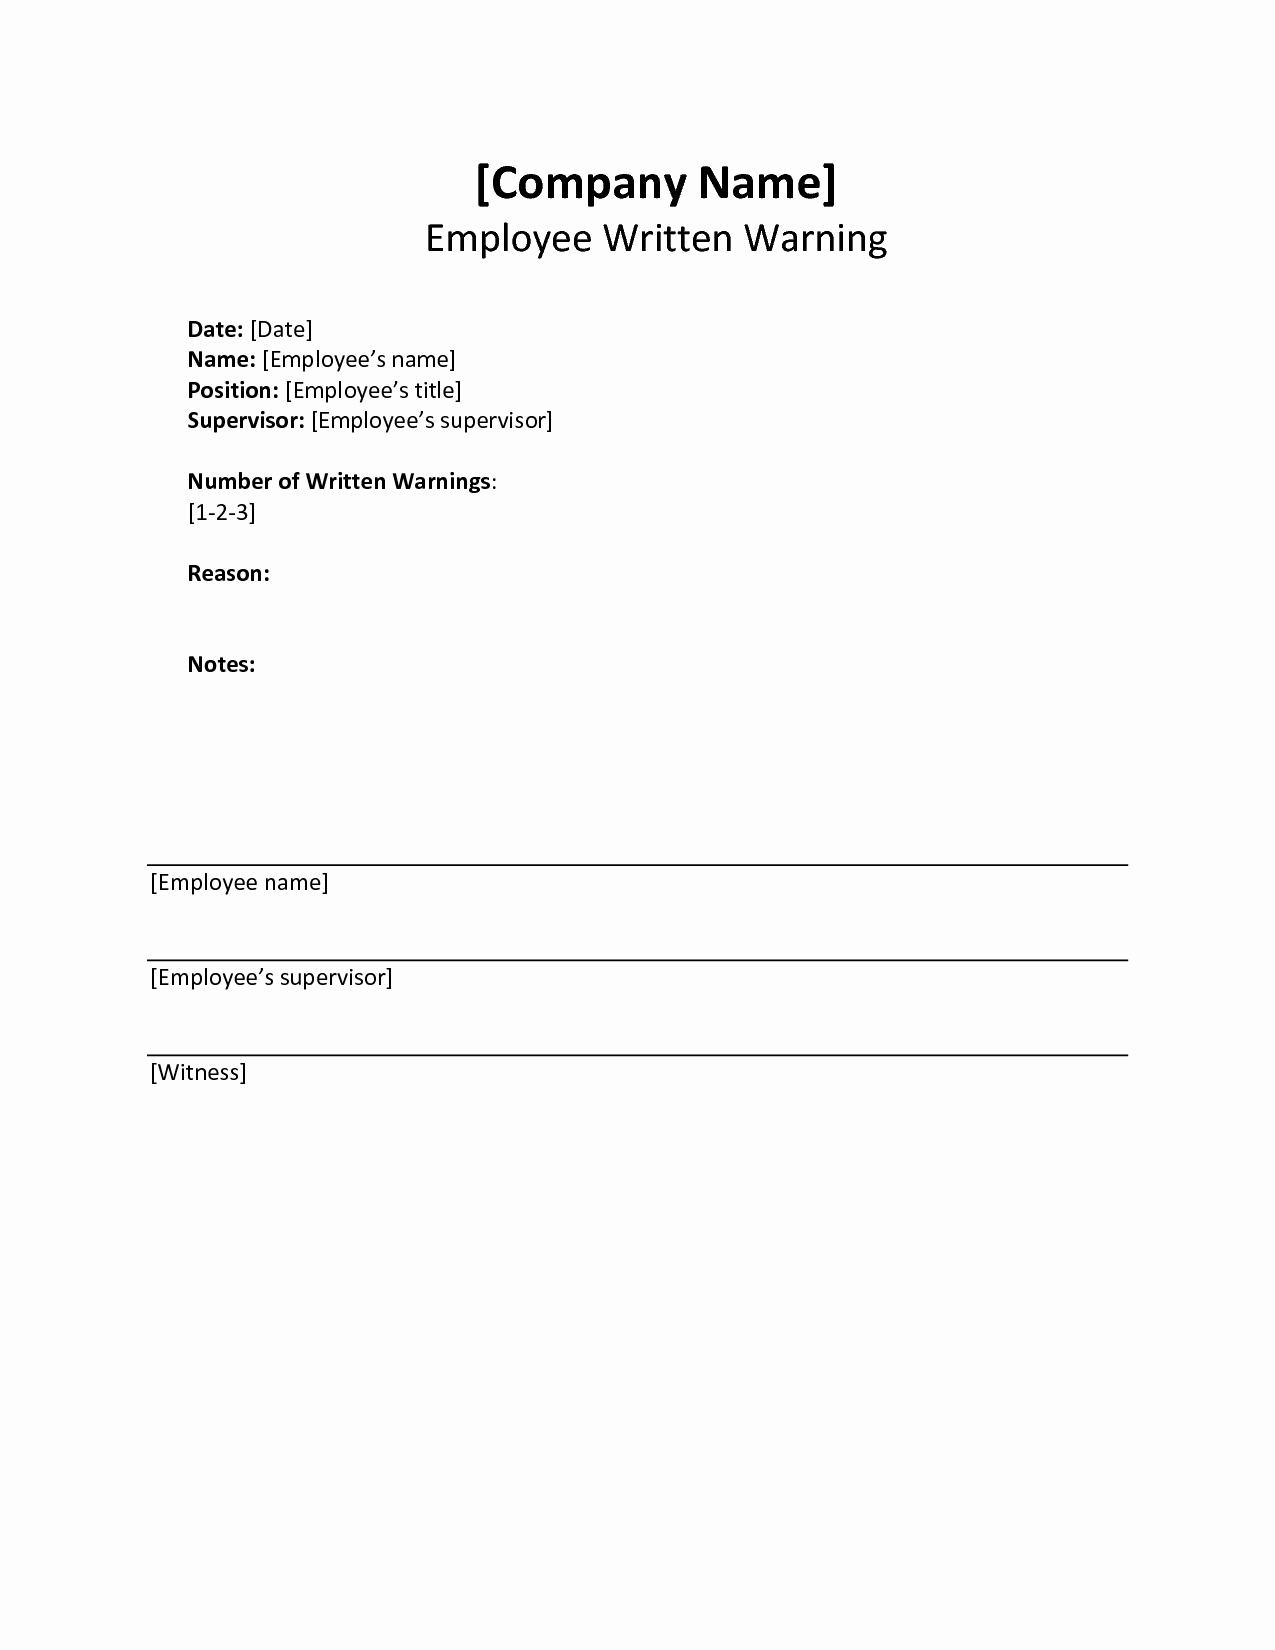 Employee Written Warning Template Free New Written Warning Template